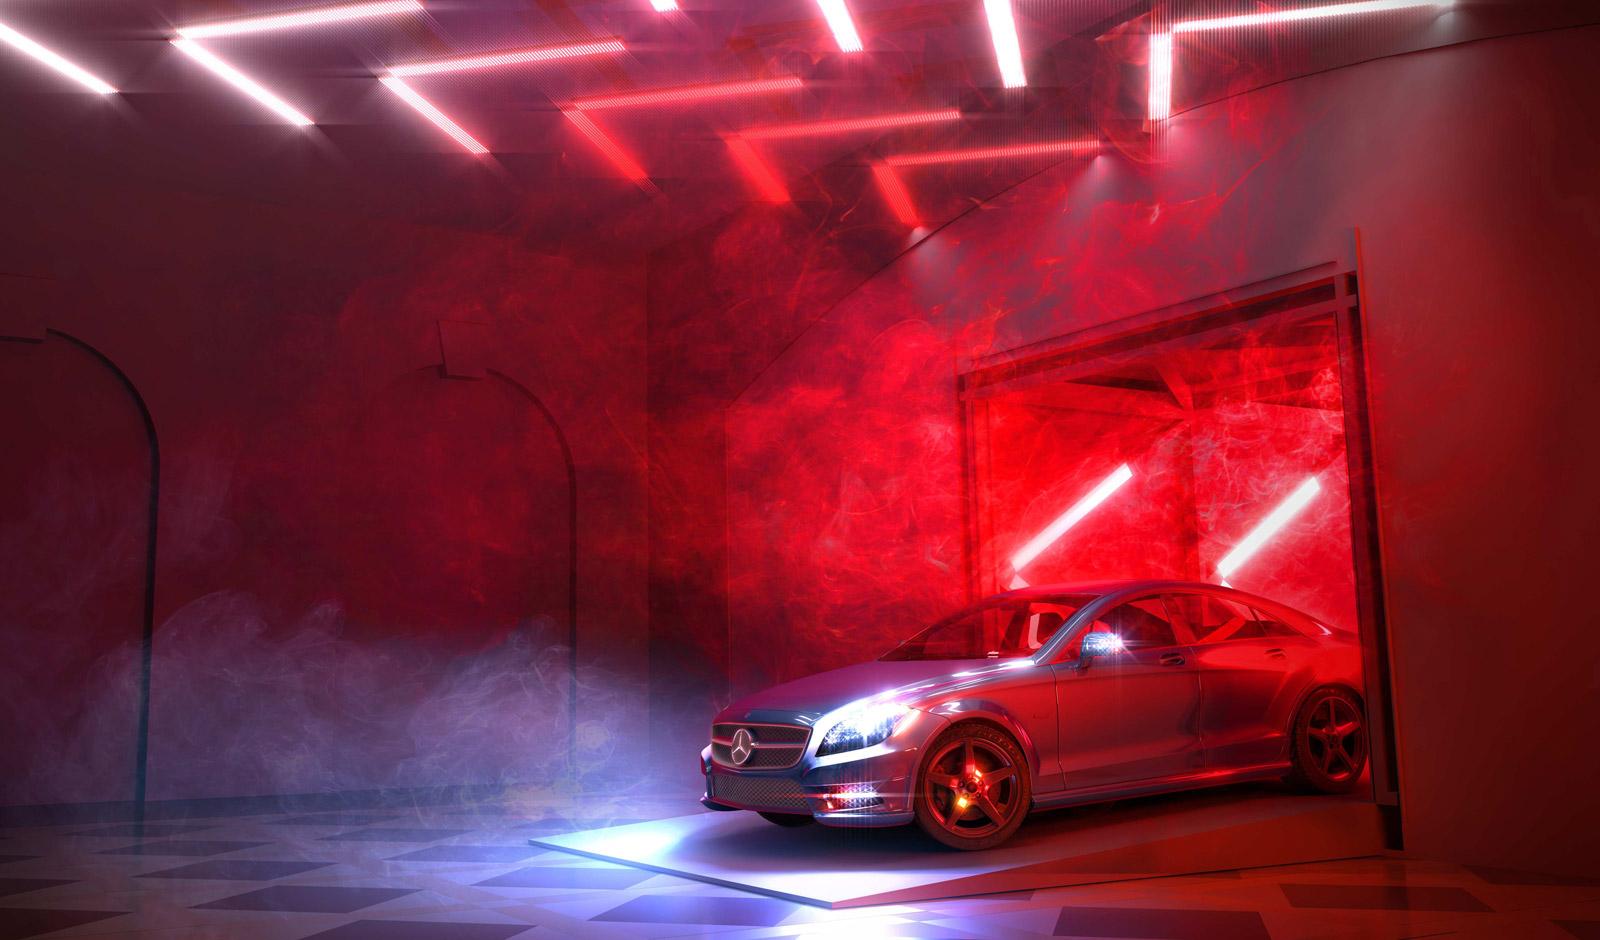 Mercedes Sets Up Drive Thru Restaurant In London Hotel